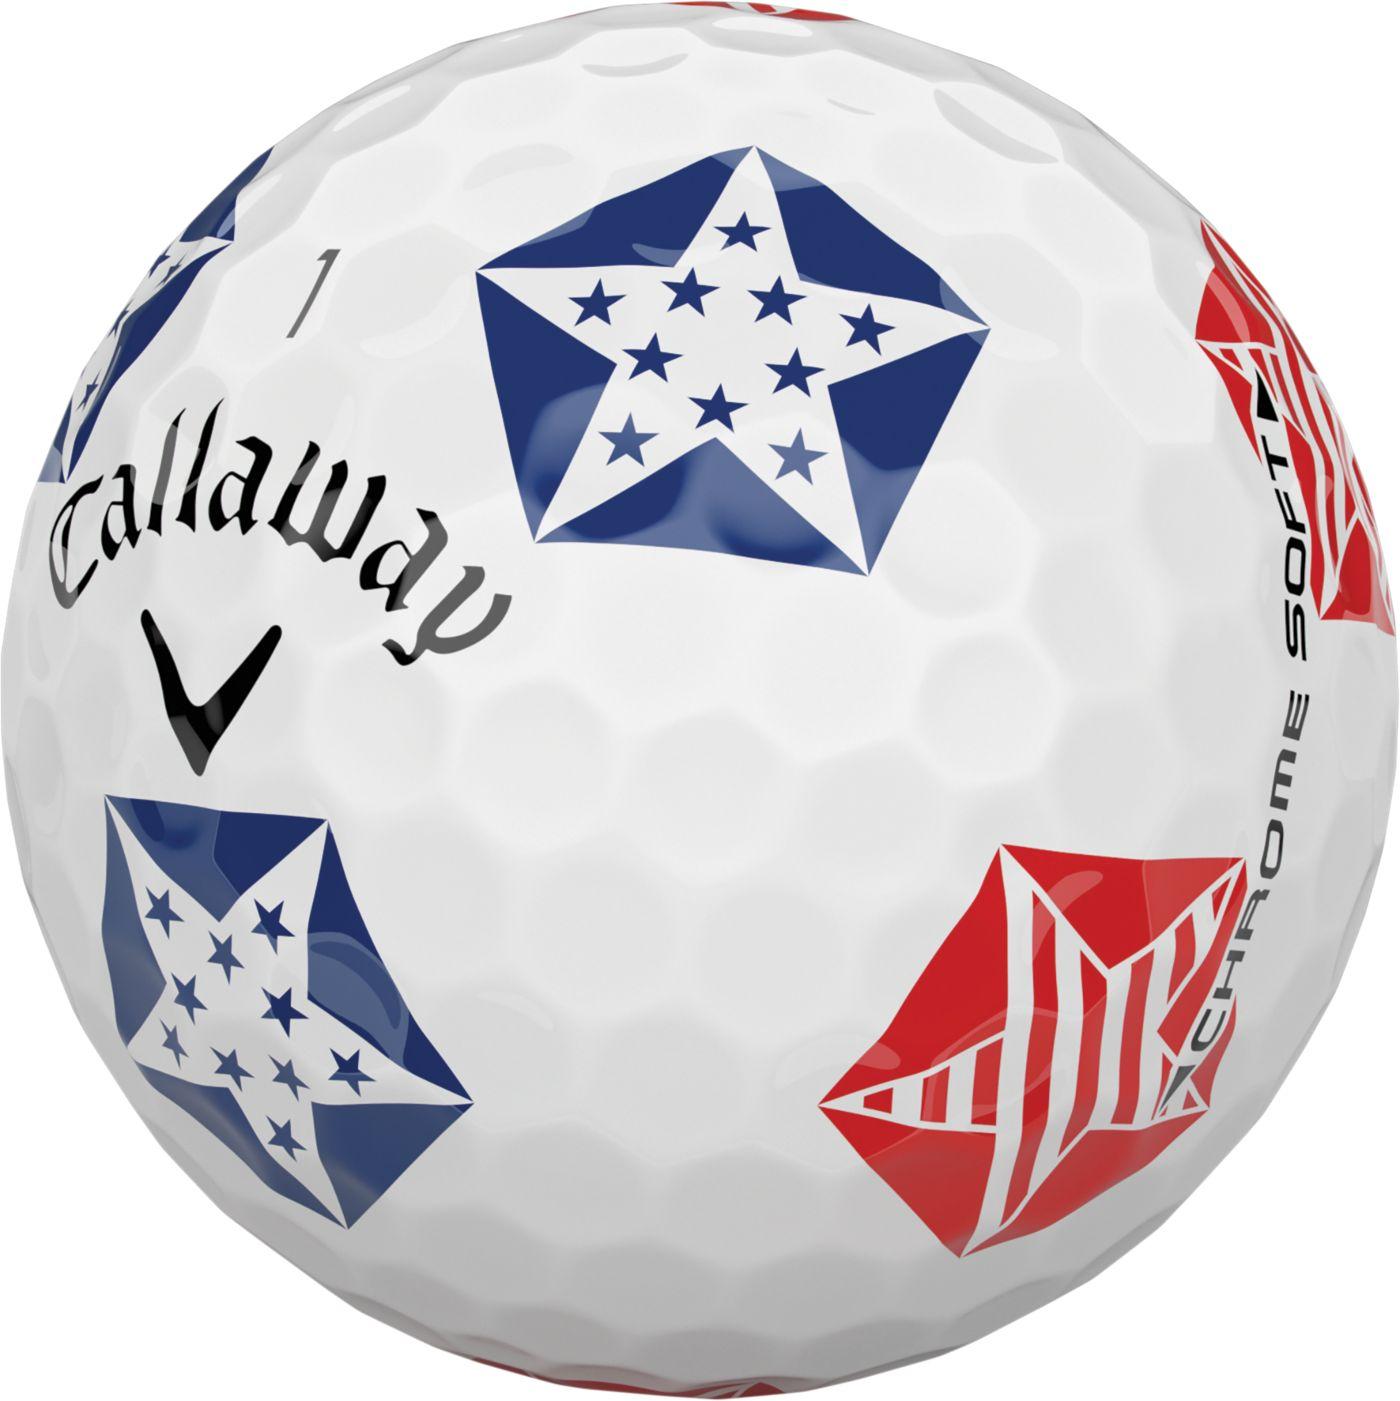 Callaway 2019 Chrome Soft Truvis Stars and Stripes Golf Balls